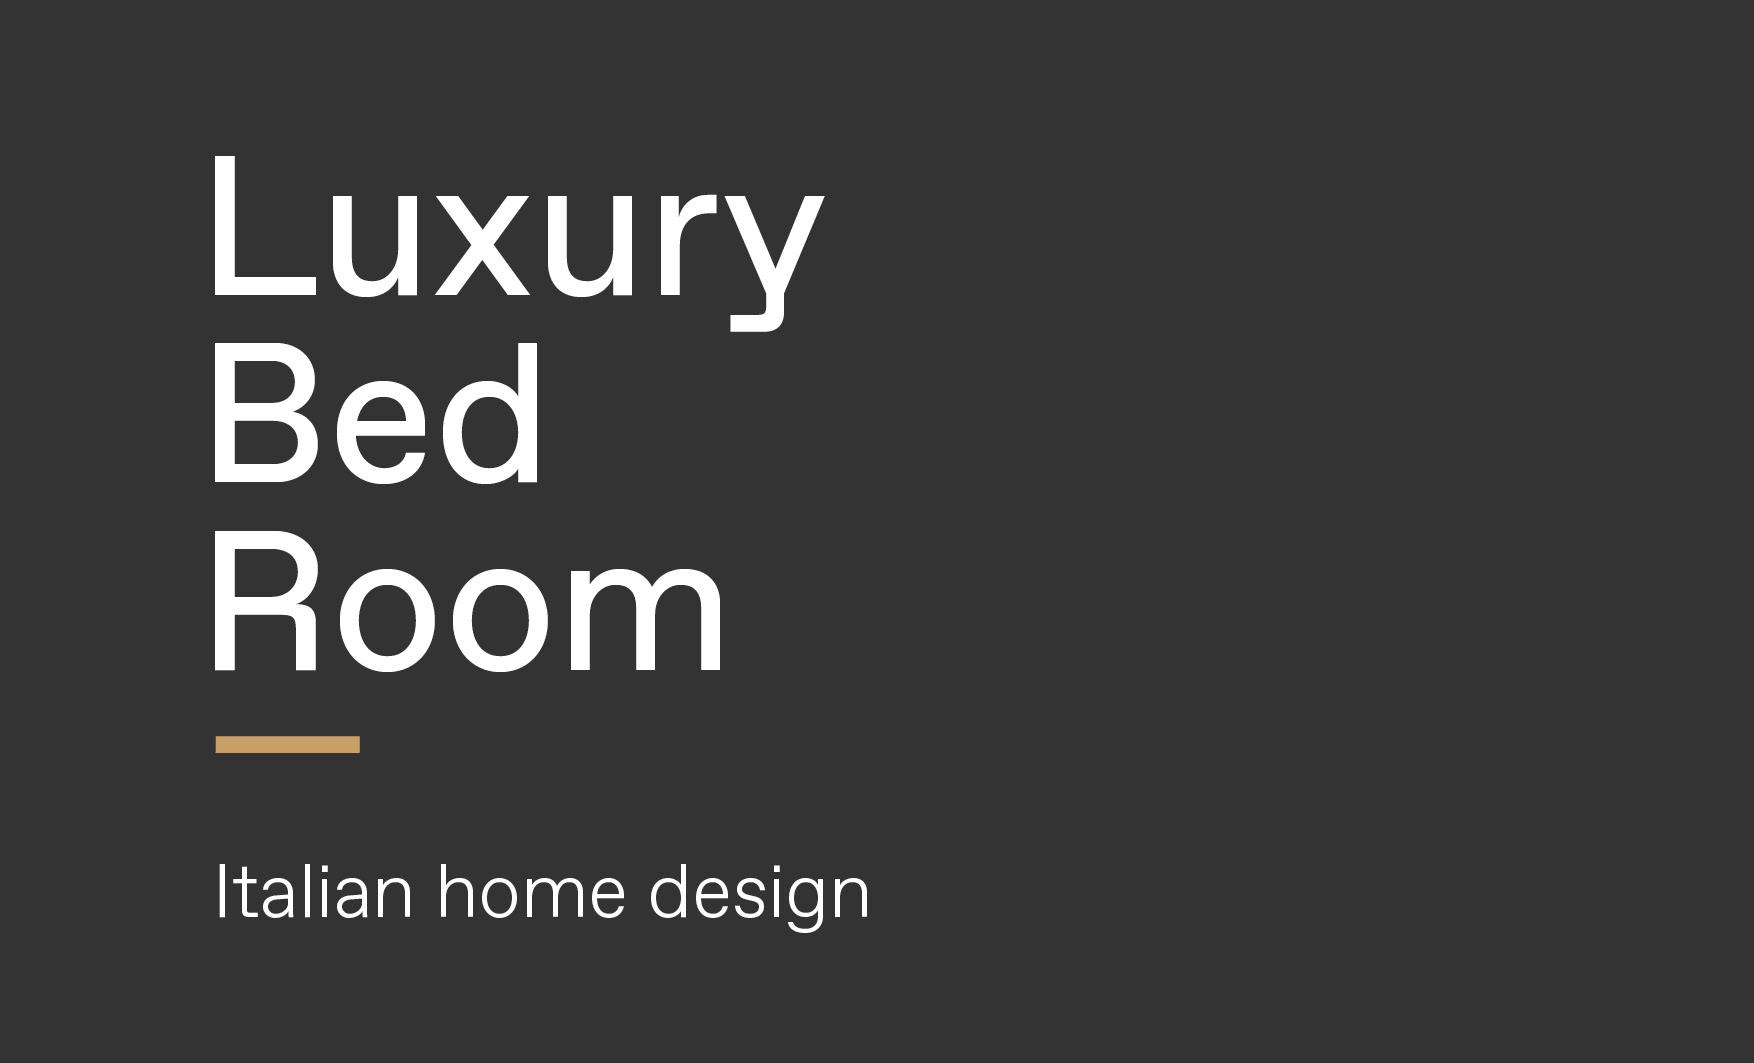 Concept of luxury Italian bedroom design made by Esperiri team